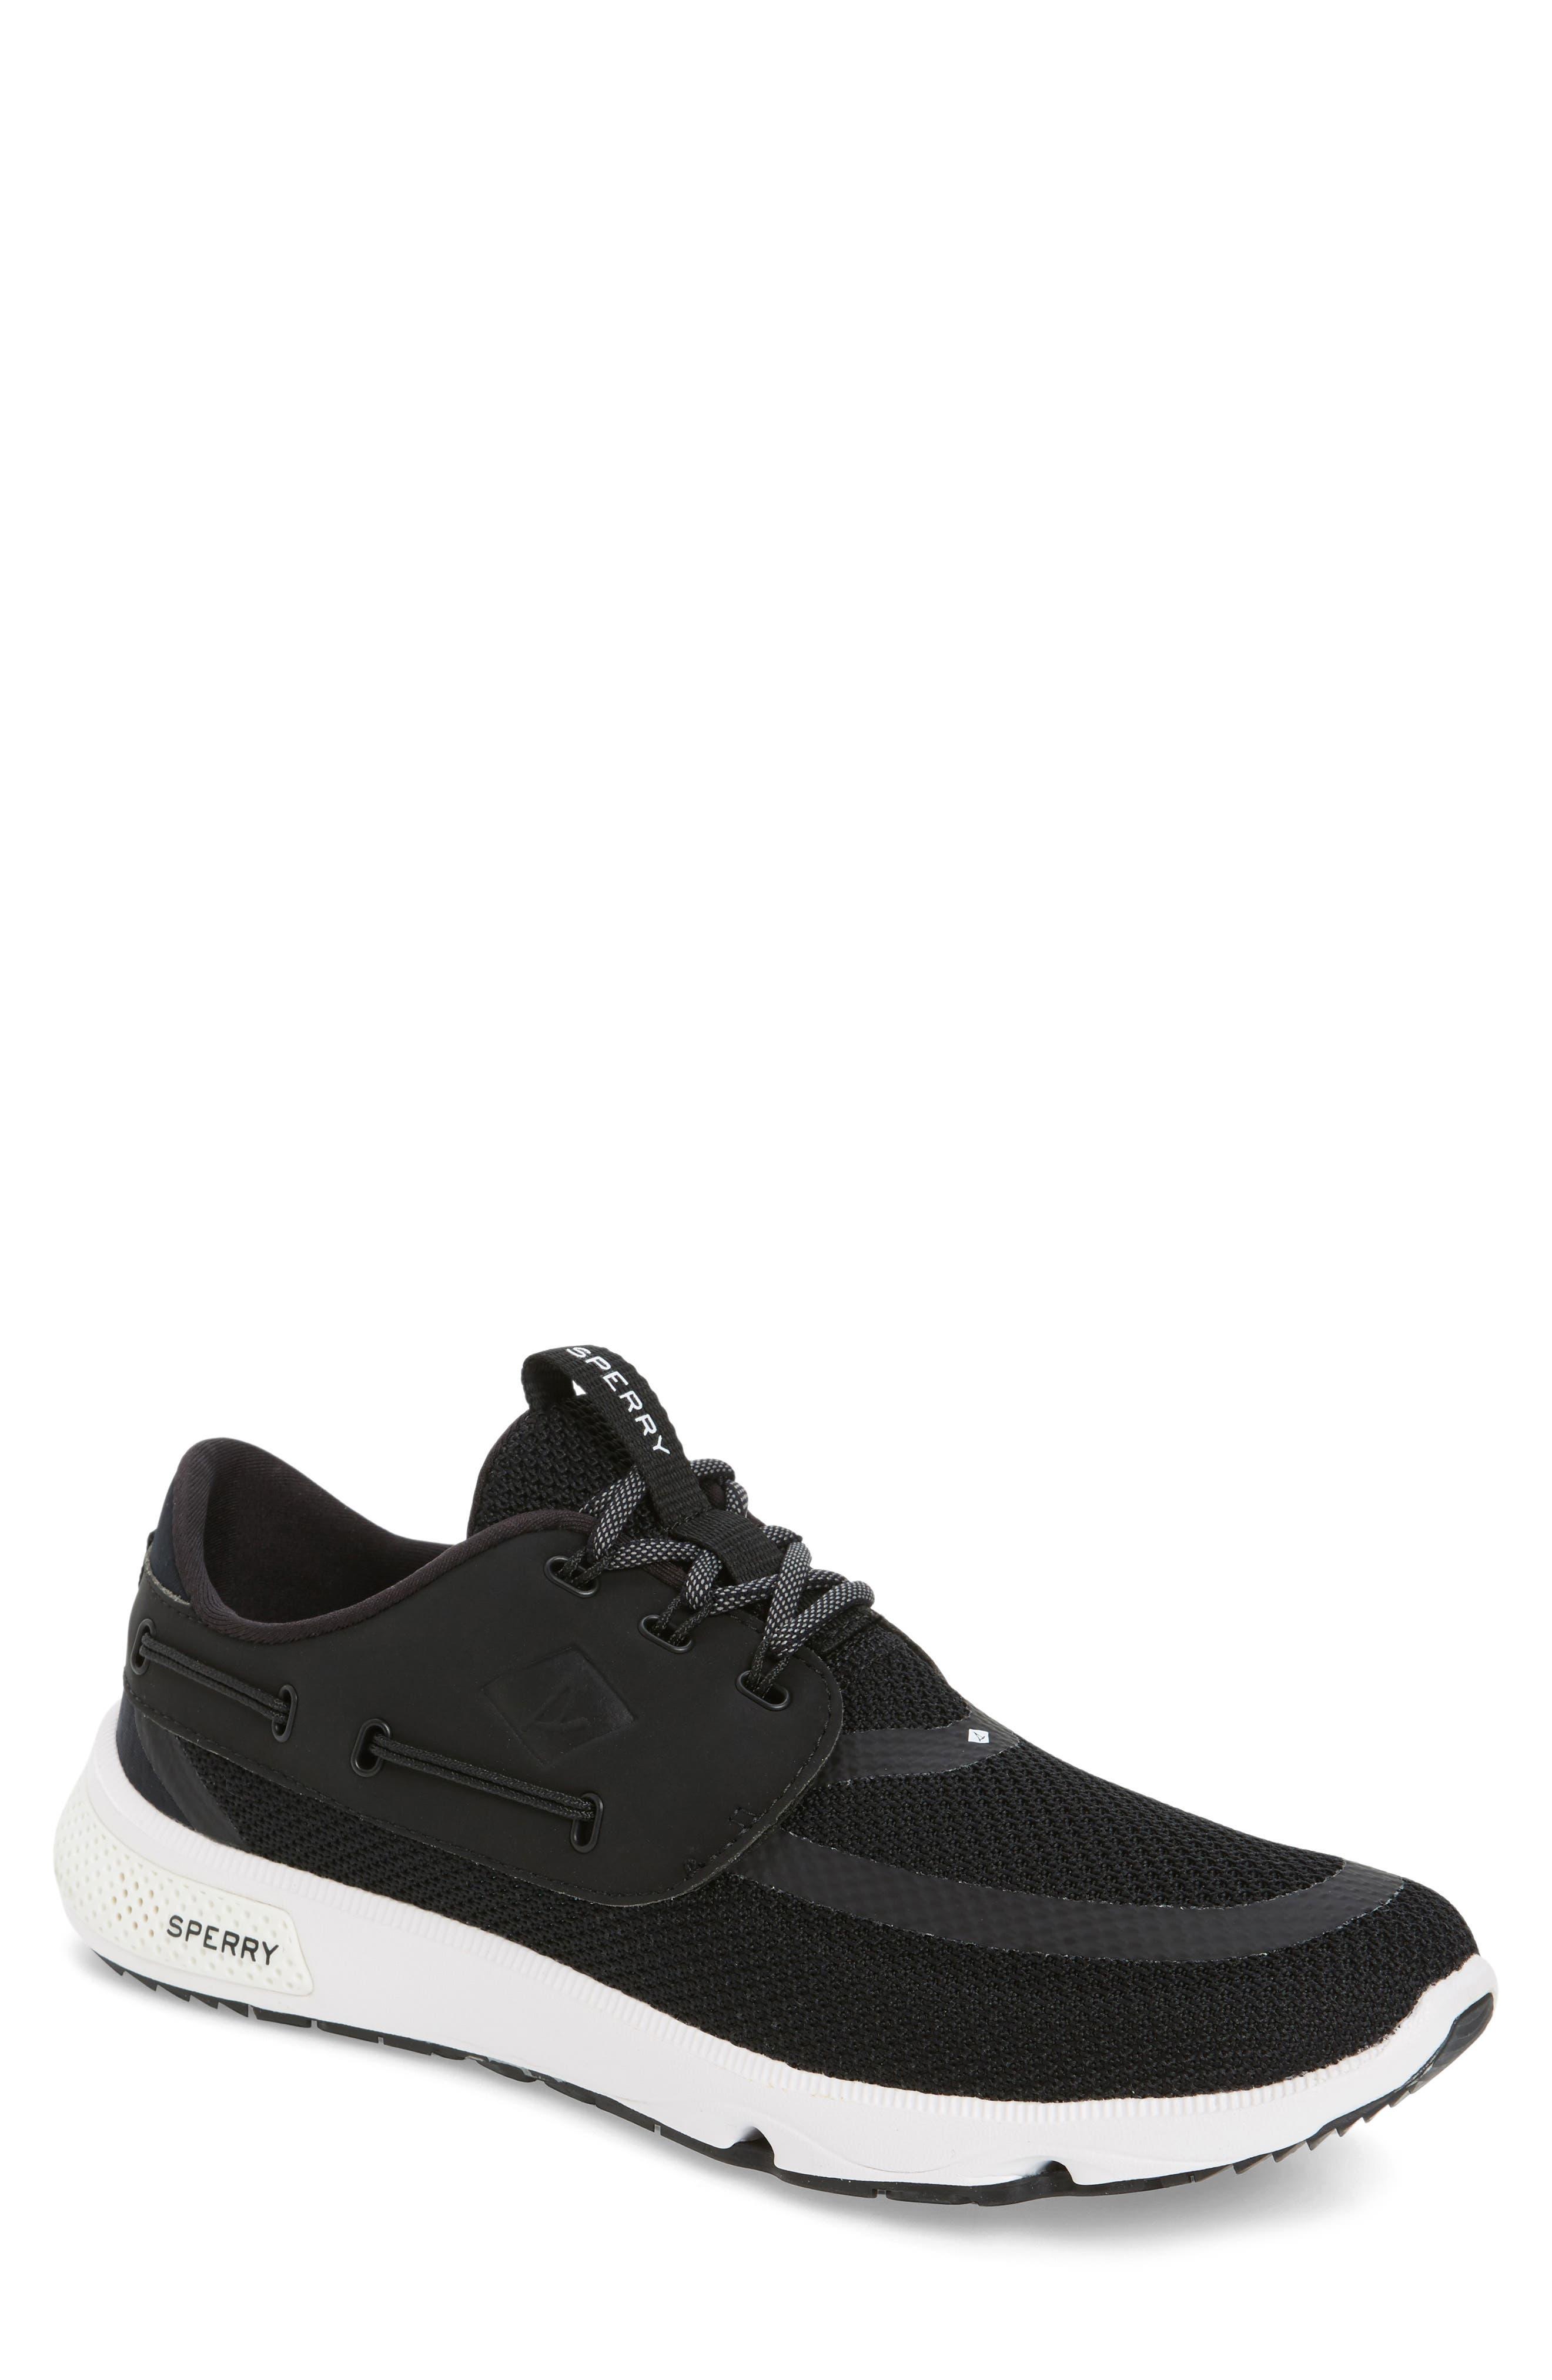 7 Seas Sneaker, Main, color, 001